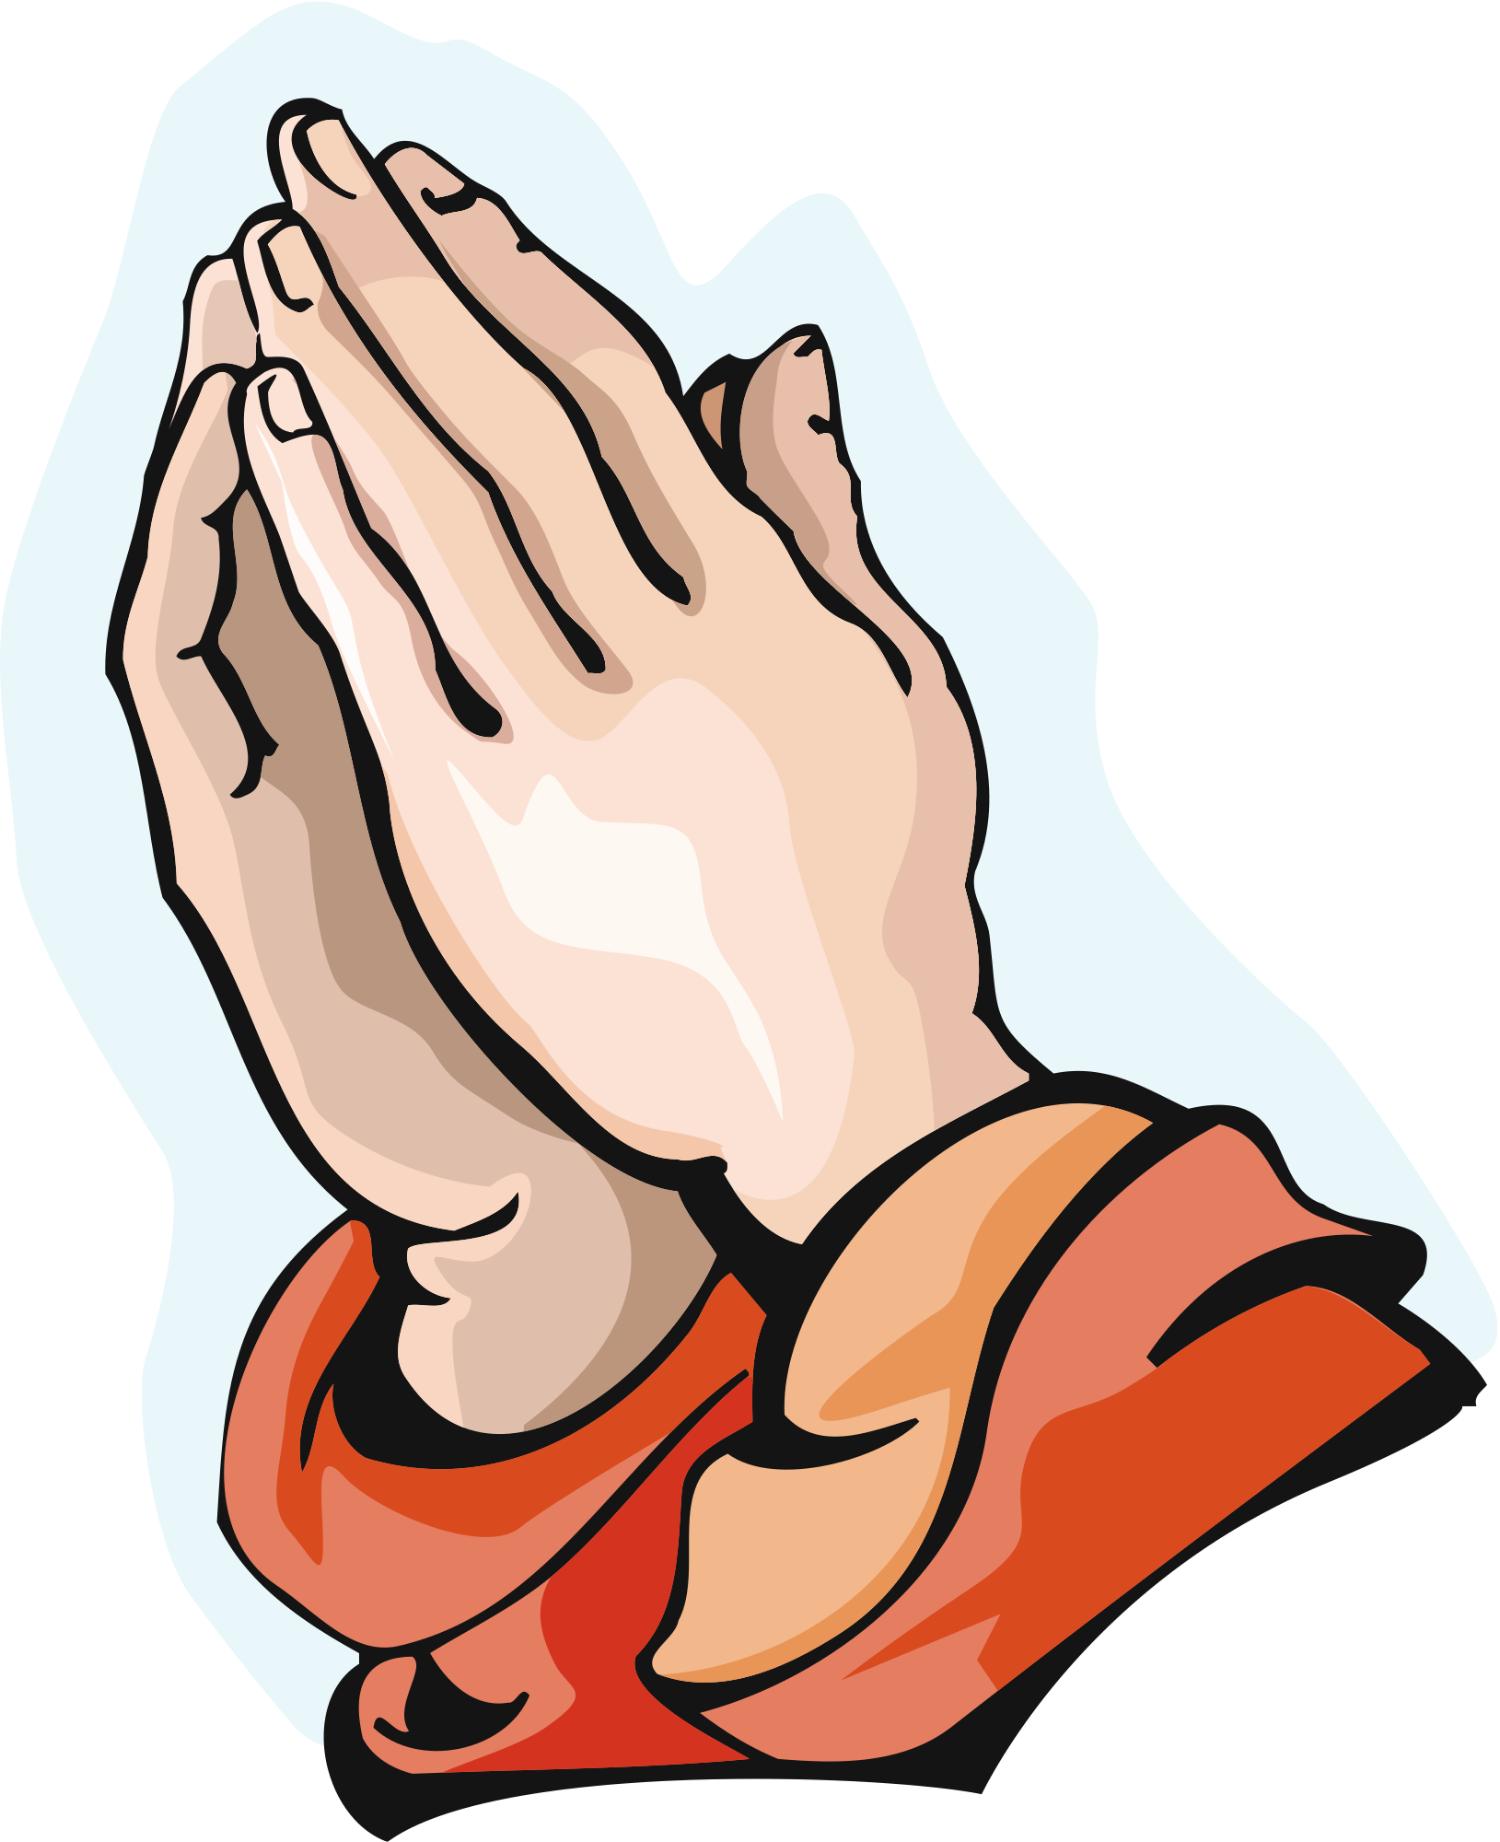 Gods clipart prayer hand Praying on Hand Free Clipart